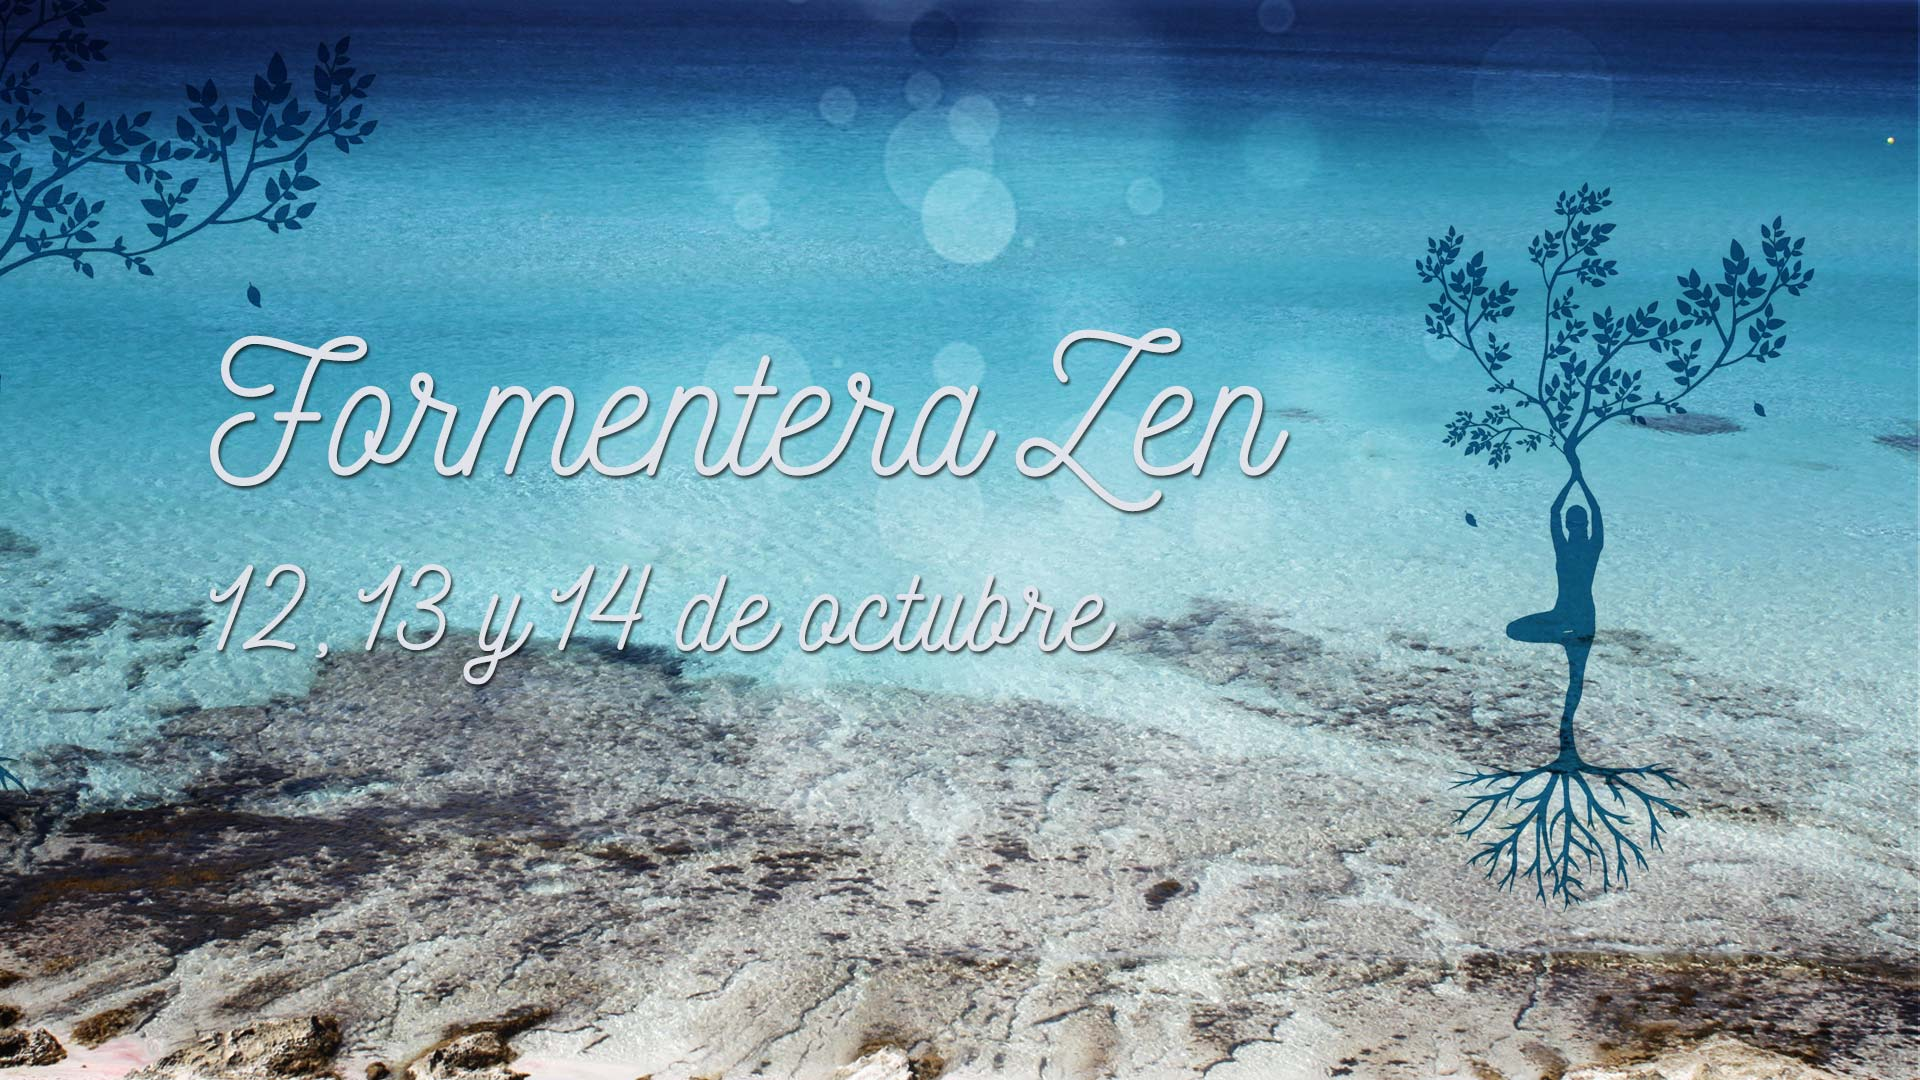 Imagen Esdeveniment Formentera Zen